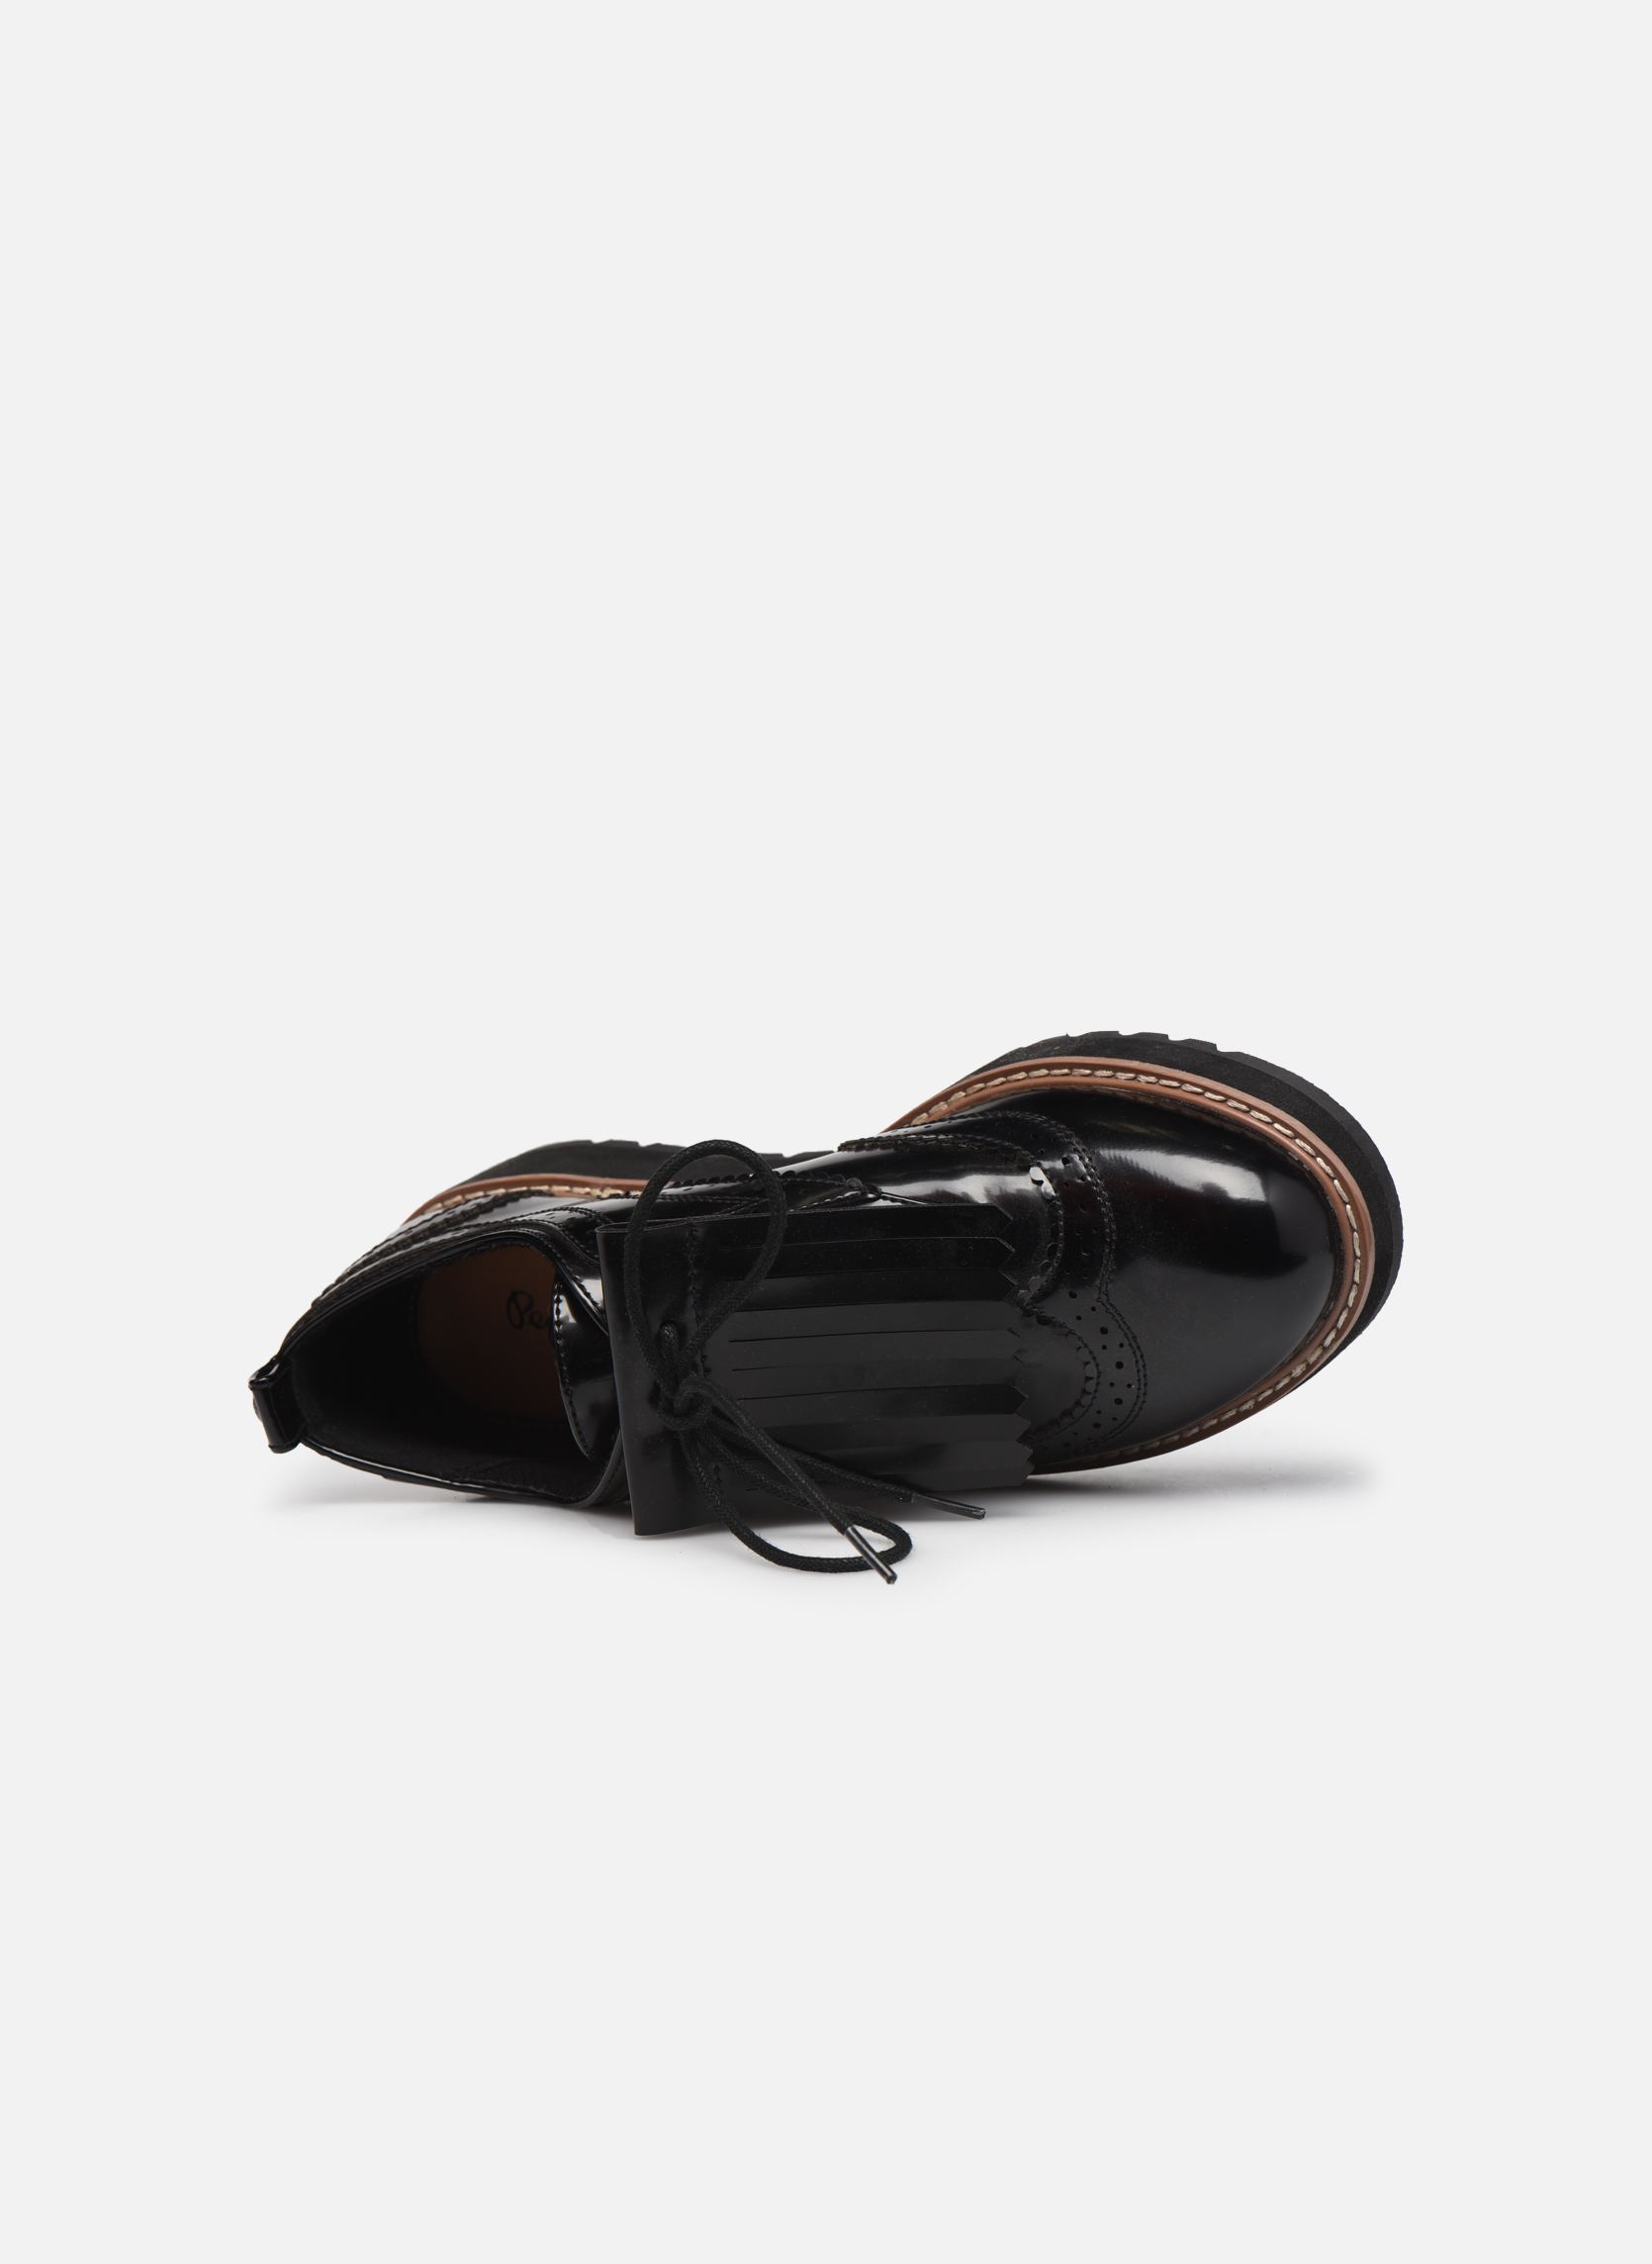 RAMSY tassel Black